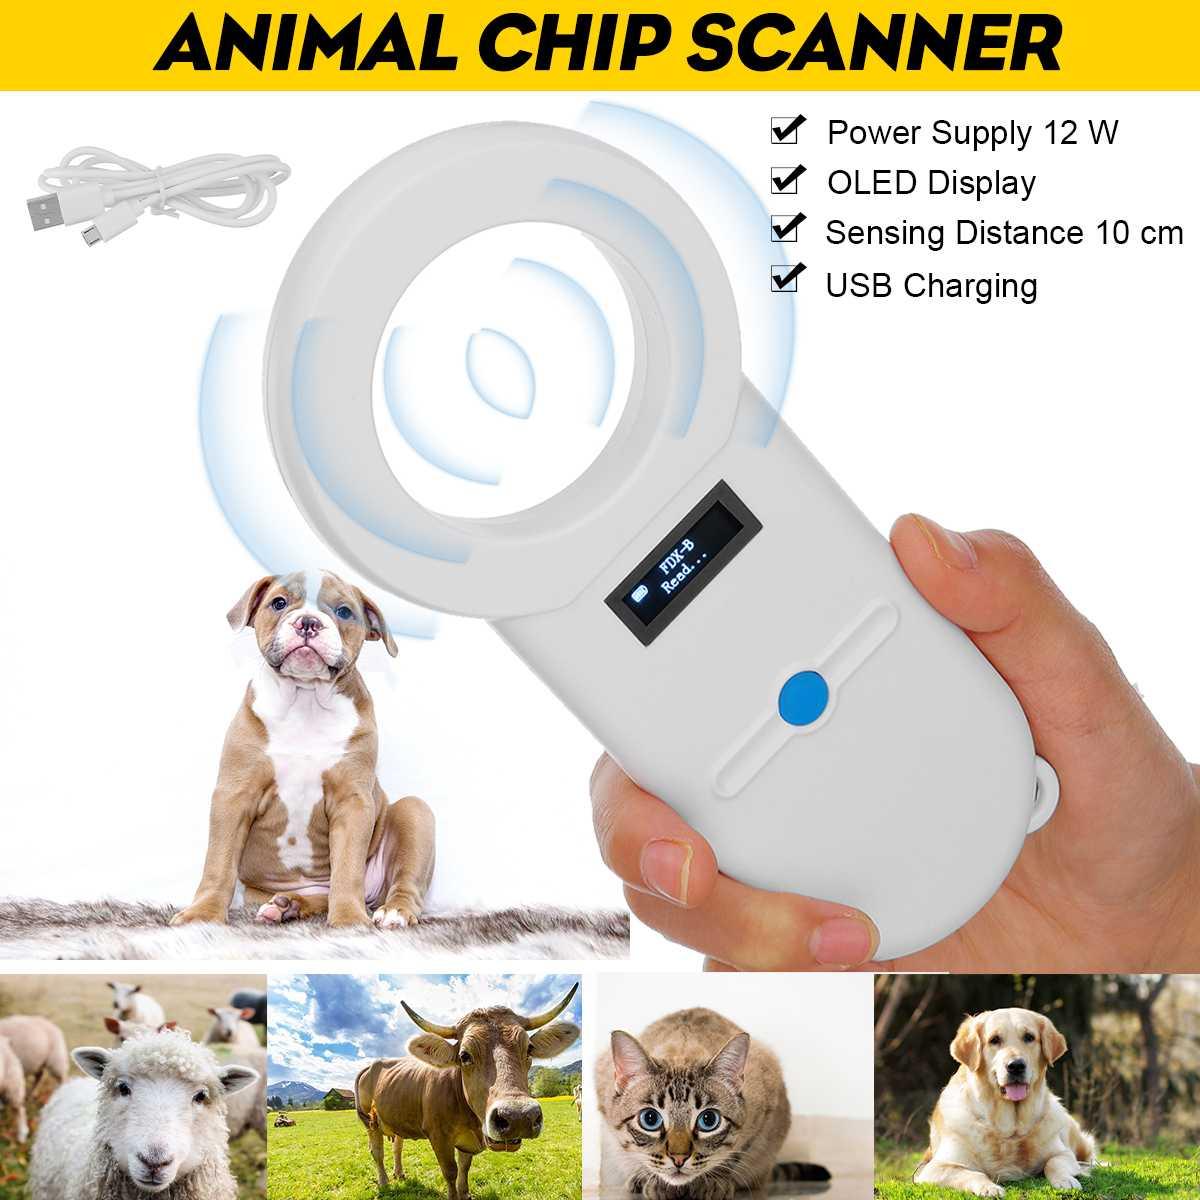 Lector de identificación de mascotas, Chip de Animal, escáner Digital, USB recargable, escáner de mano para Microchip, General para gato, perro, caballo